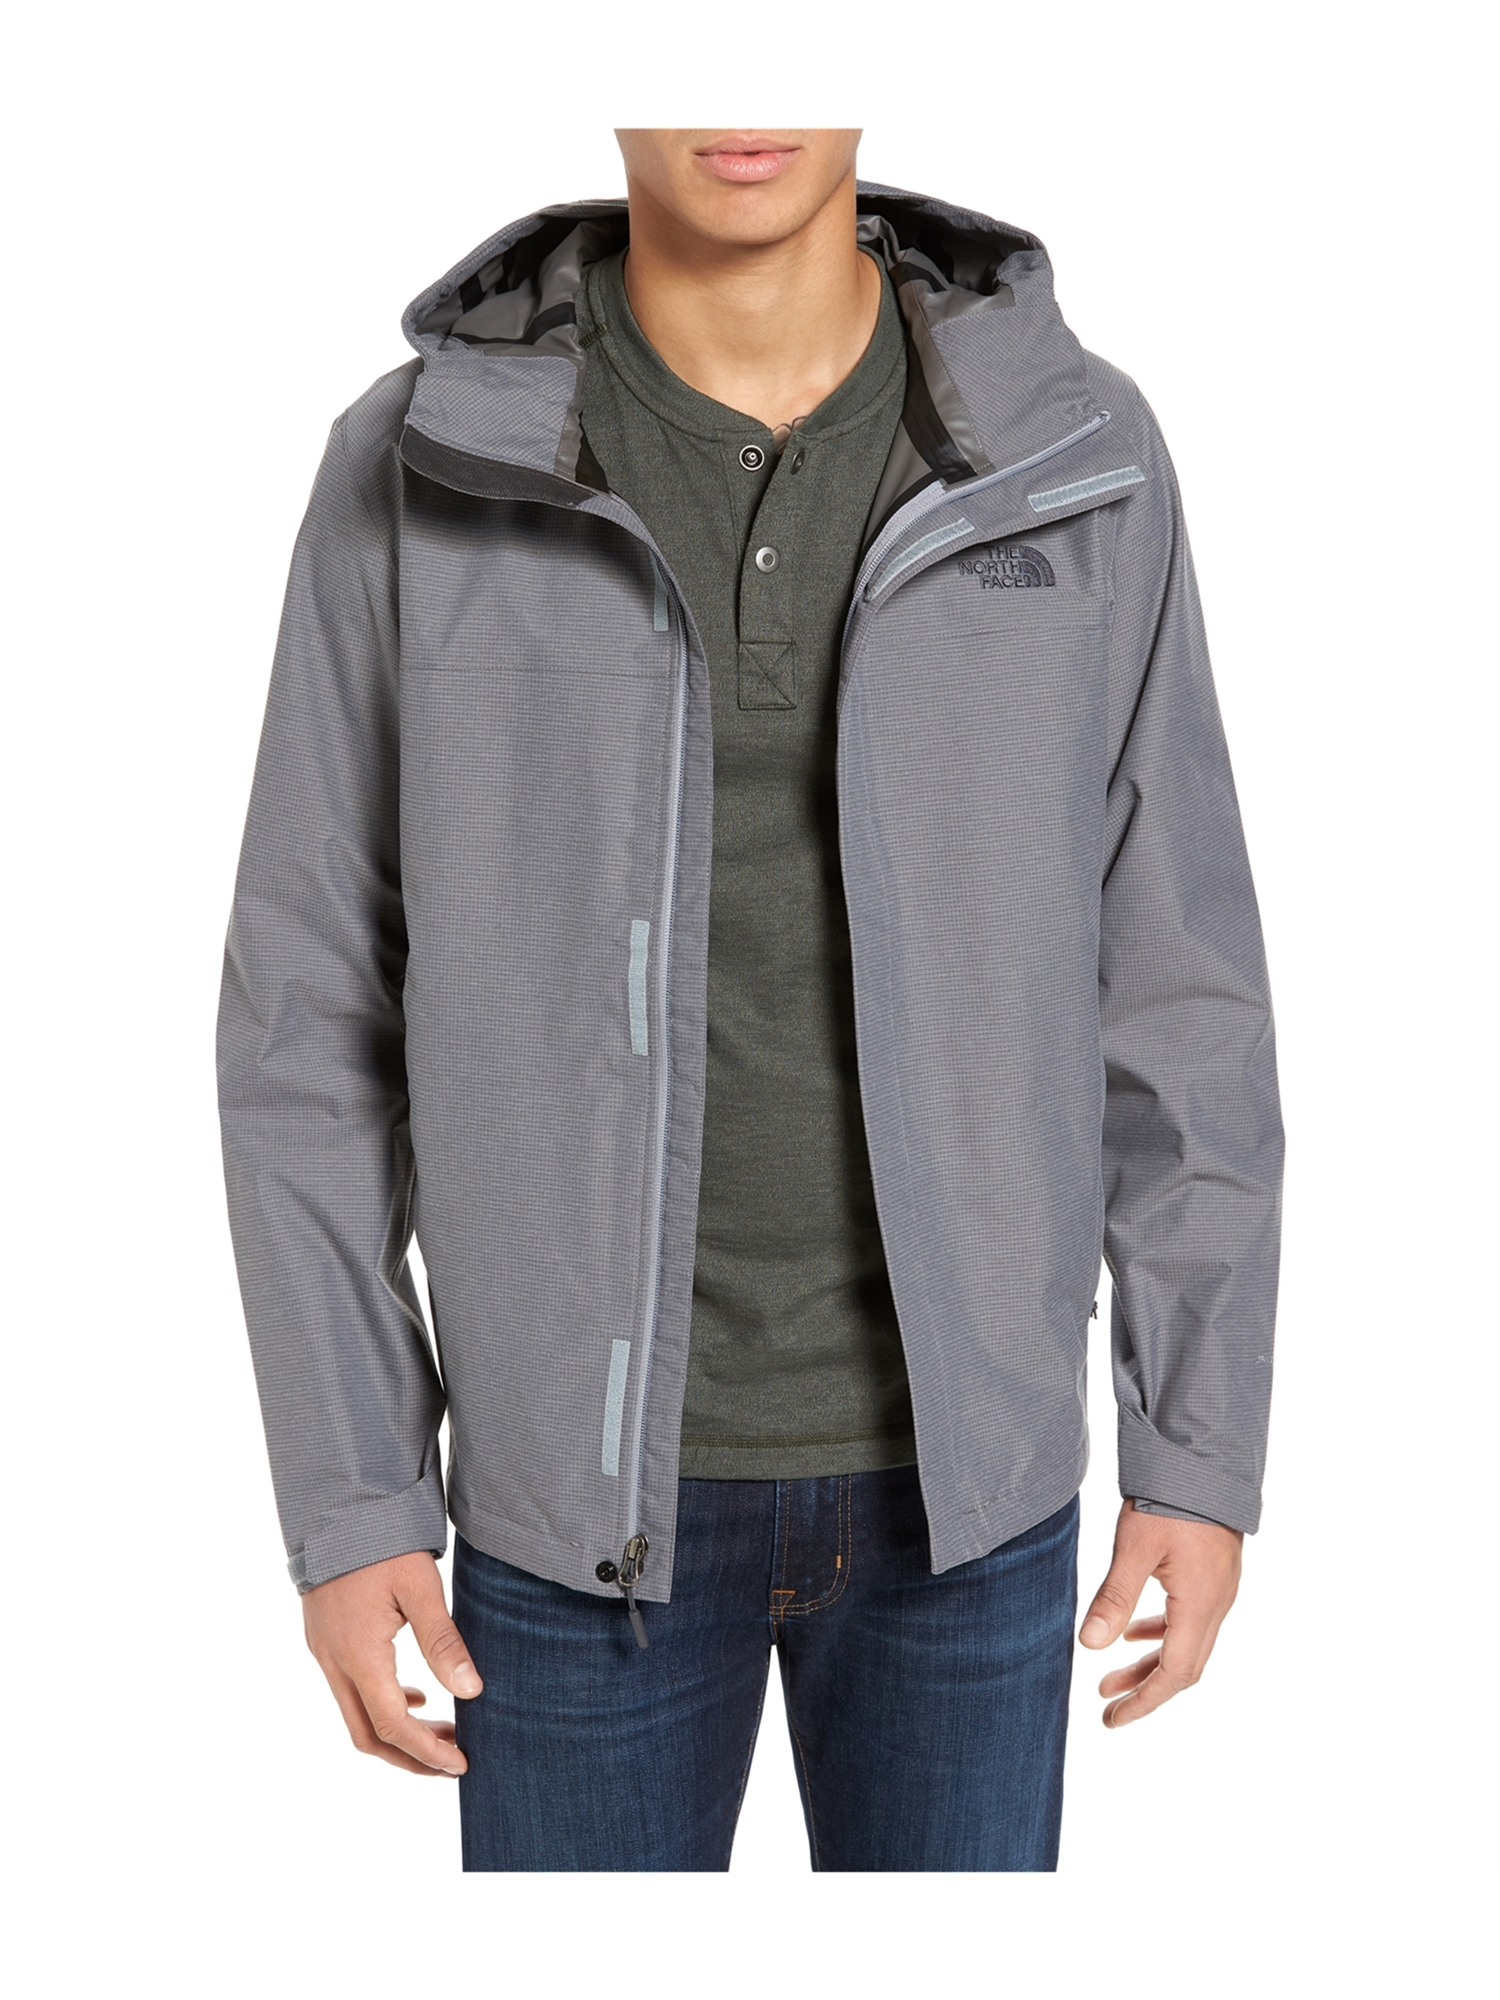 a037e3710 The North Face Mens Venture 2 Hooded Raincoat medgray 2XL